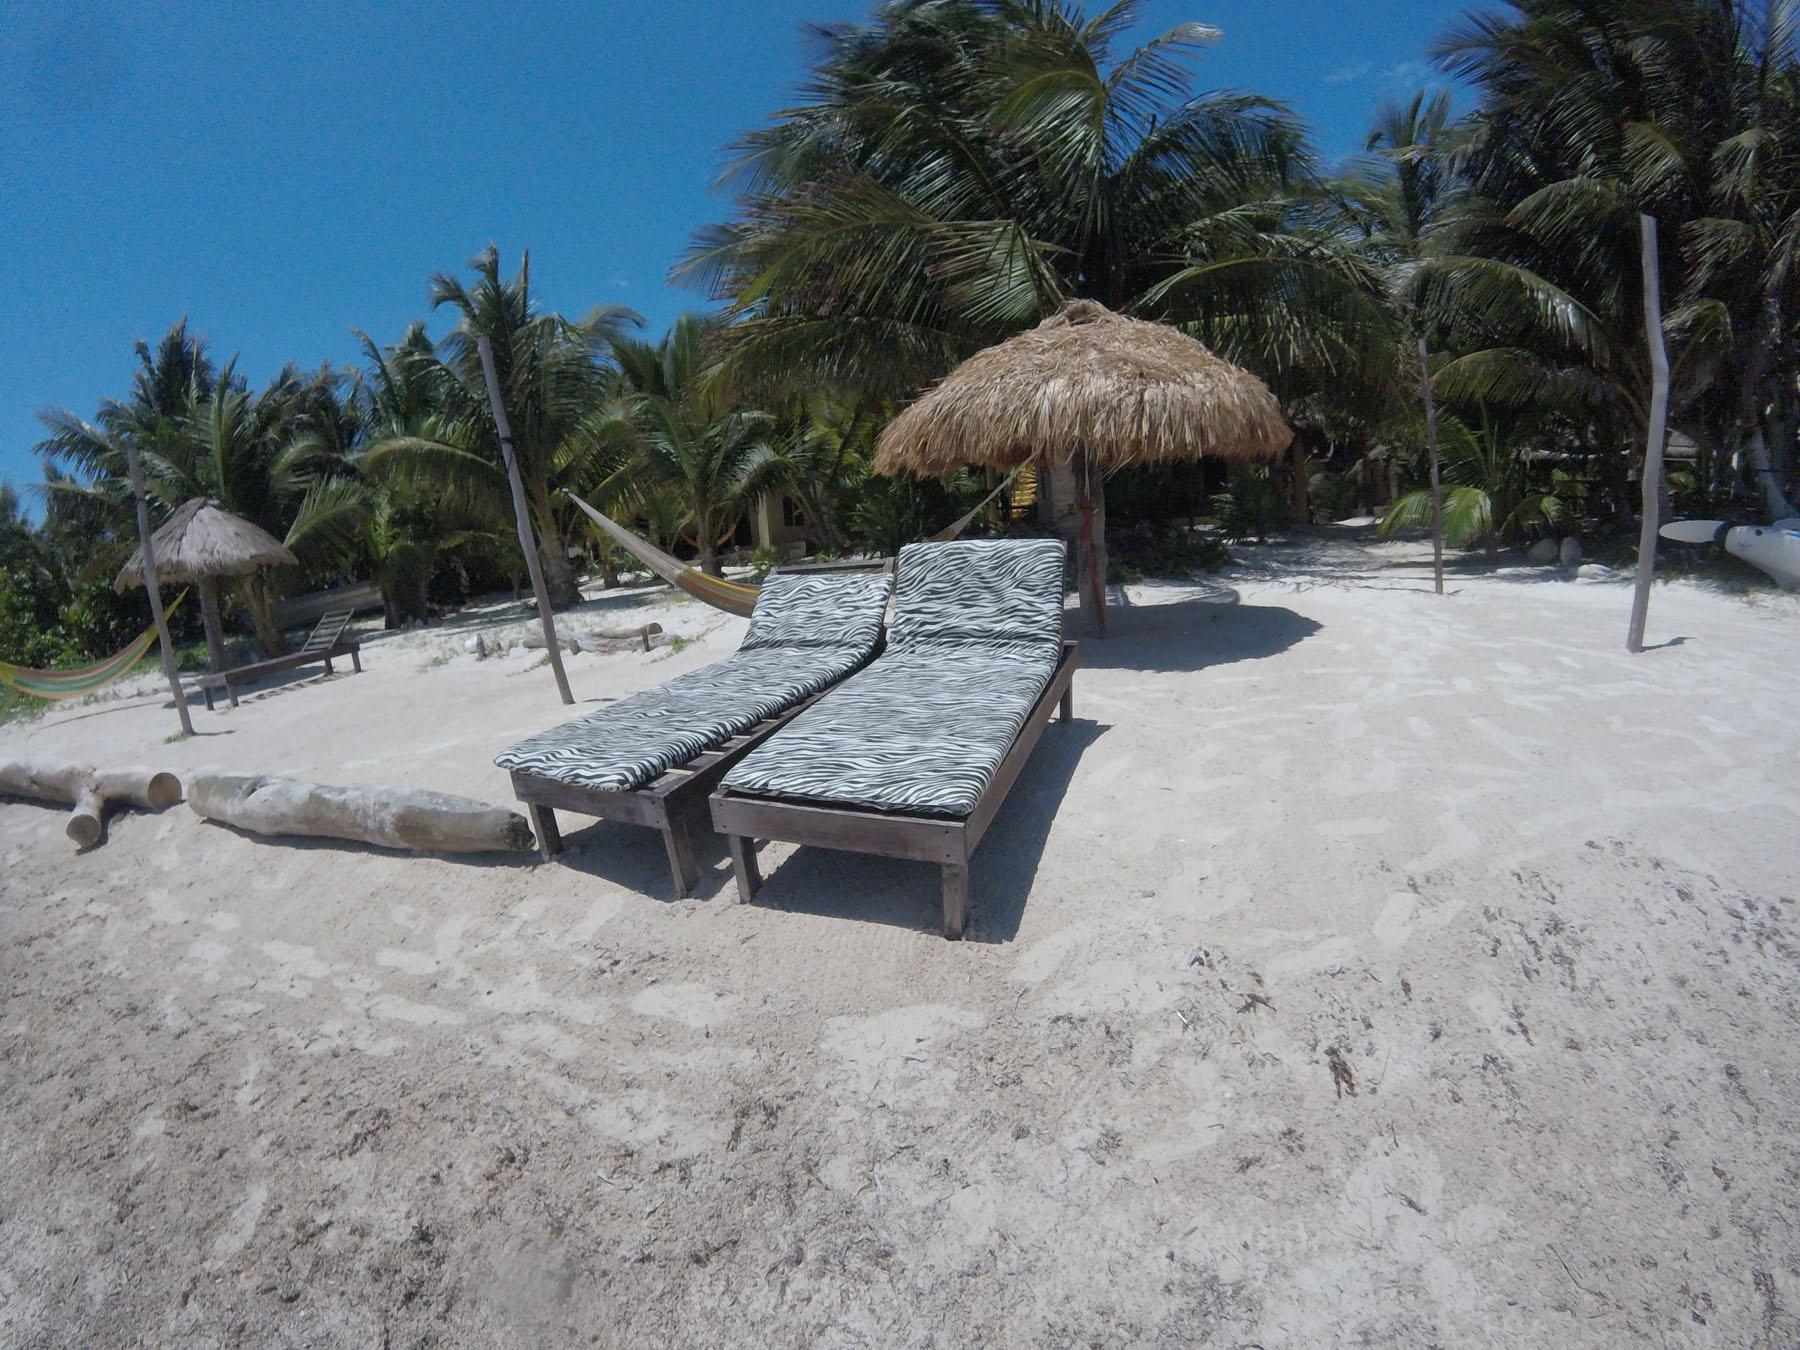 Eco Hotel Restaurant Maya Luna Mahahual. Your beach lounger is waiting for you at Hotel Maya Luna beach. In Mahahual, Costa Maya